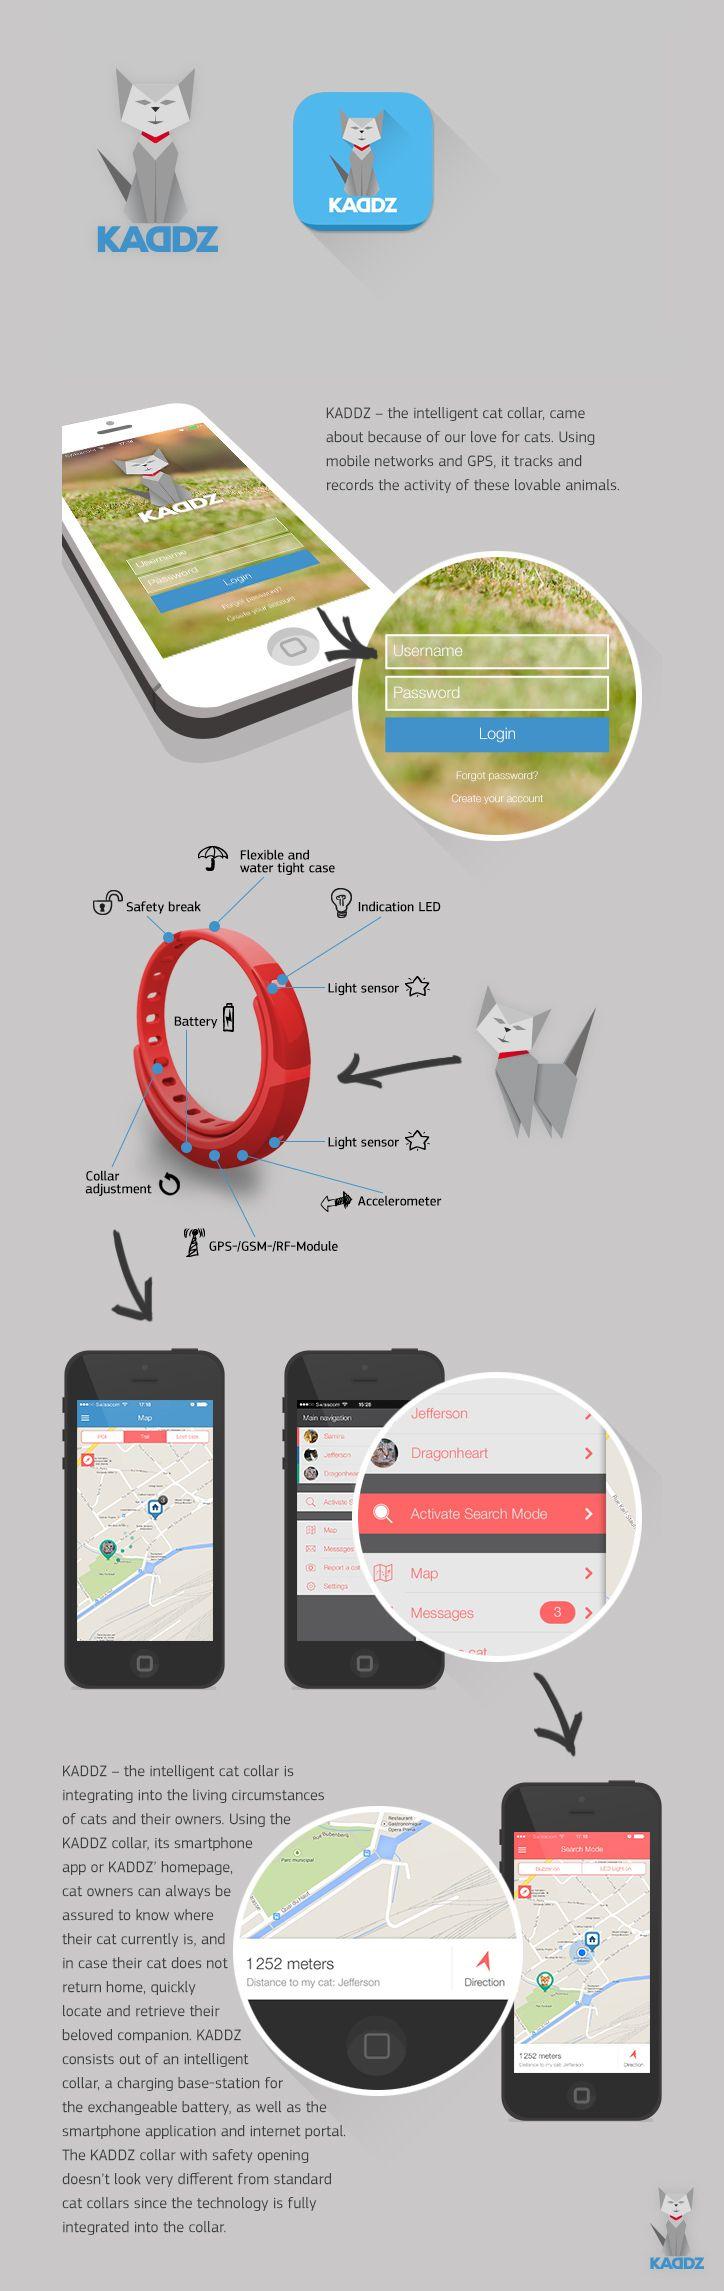 KADDZ - The Intelligent GPS Cat Collar   App Design / Concept - www.kaddz.com